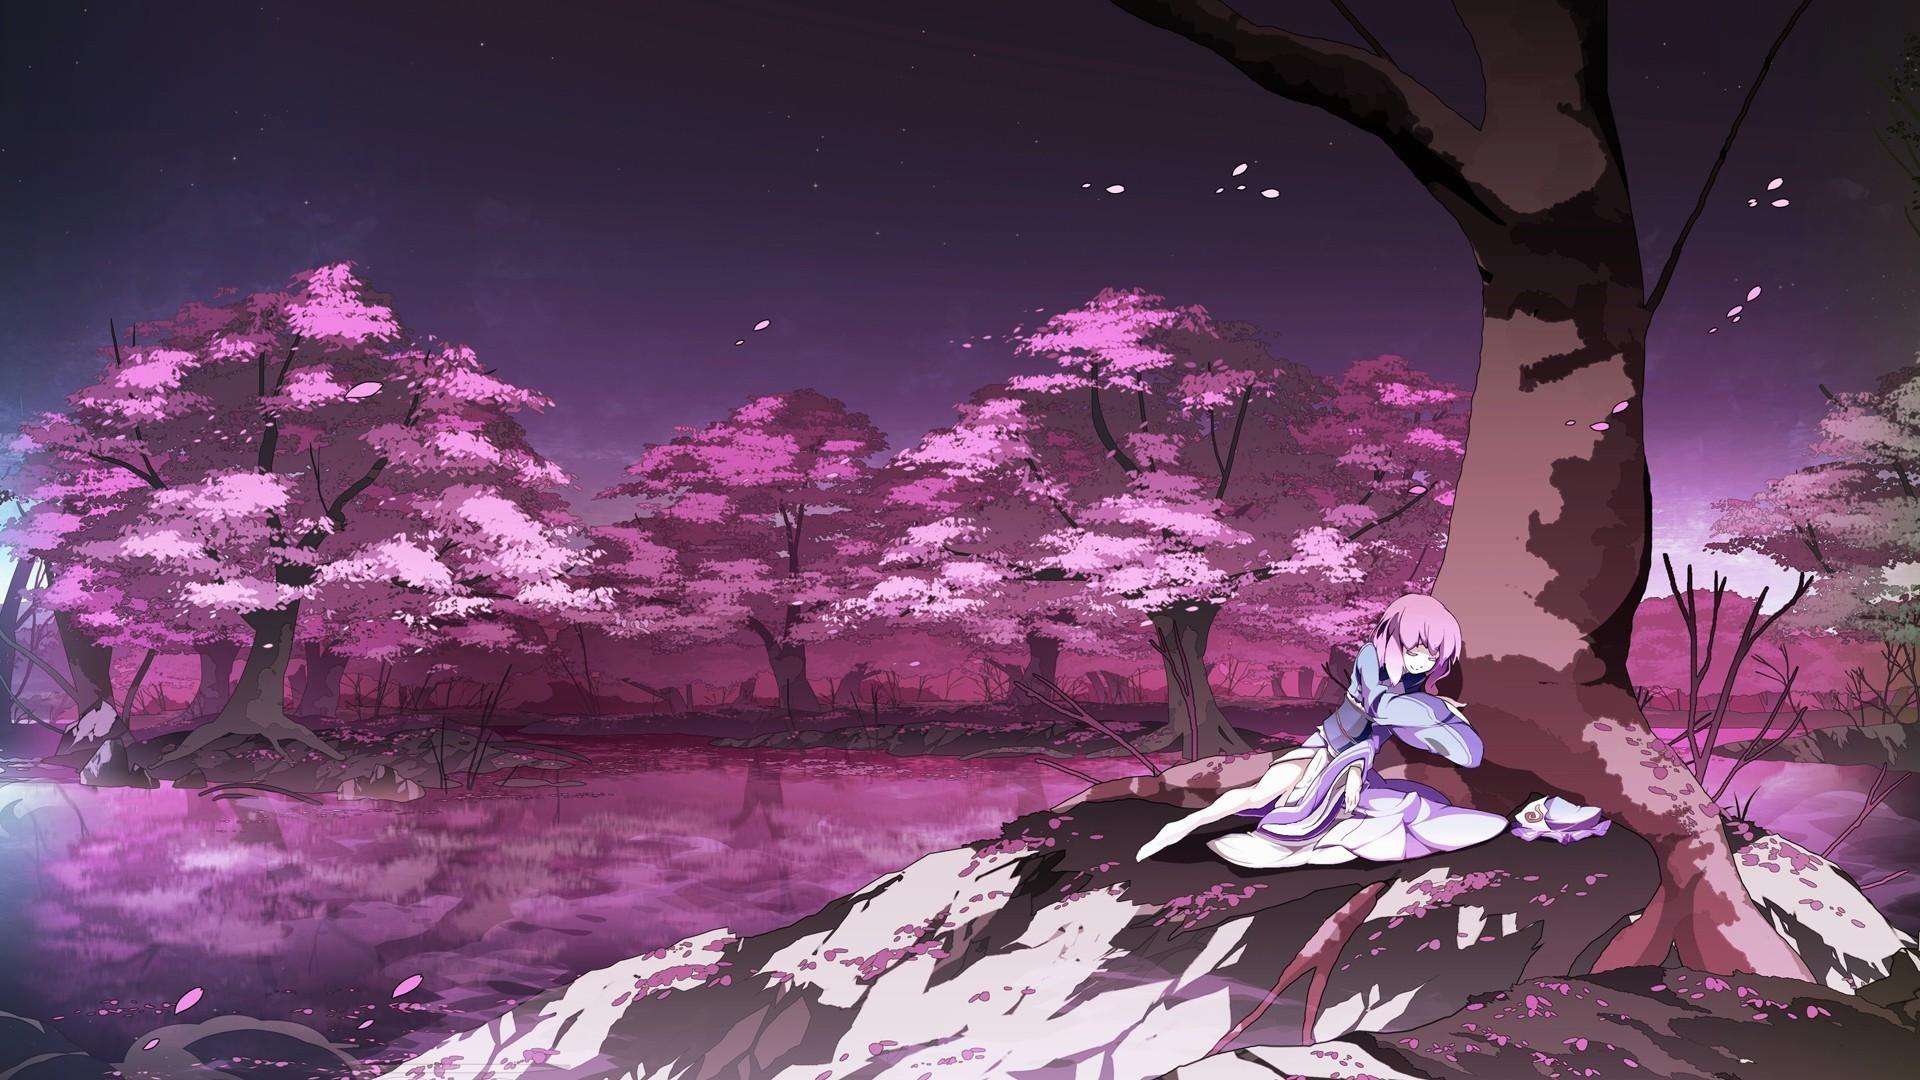 Cherry Blossom Tree Wallpaper (60+ images)